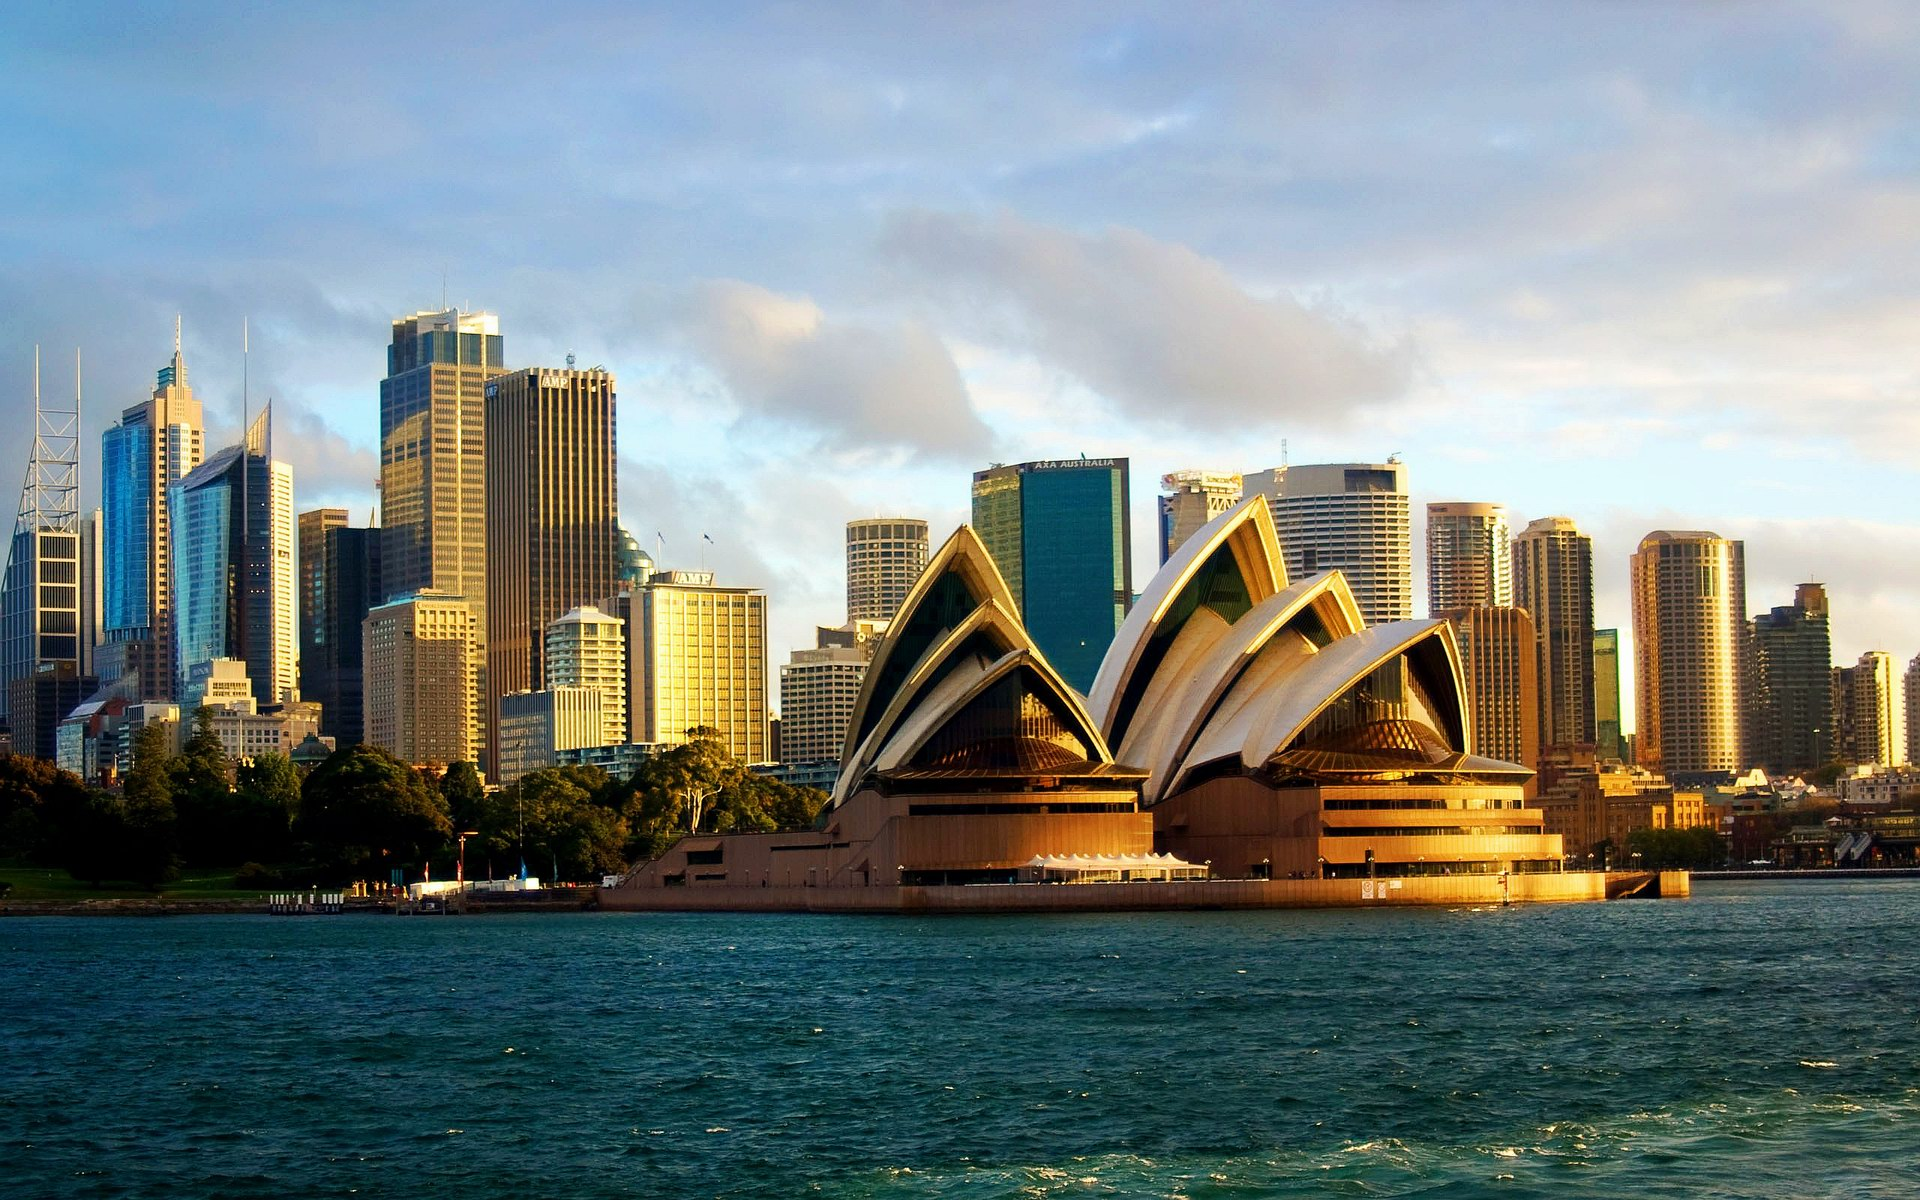 Sydney Opera House Cityscape Wallpaper Travel HD Wallpapers 1920x1200